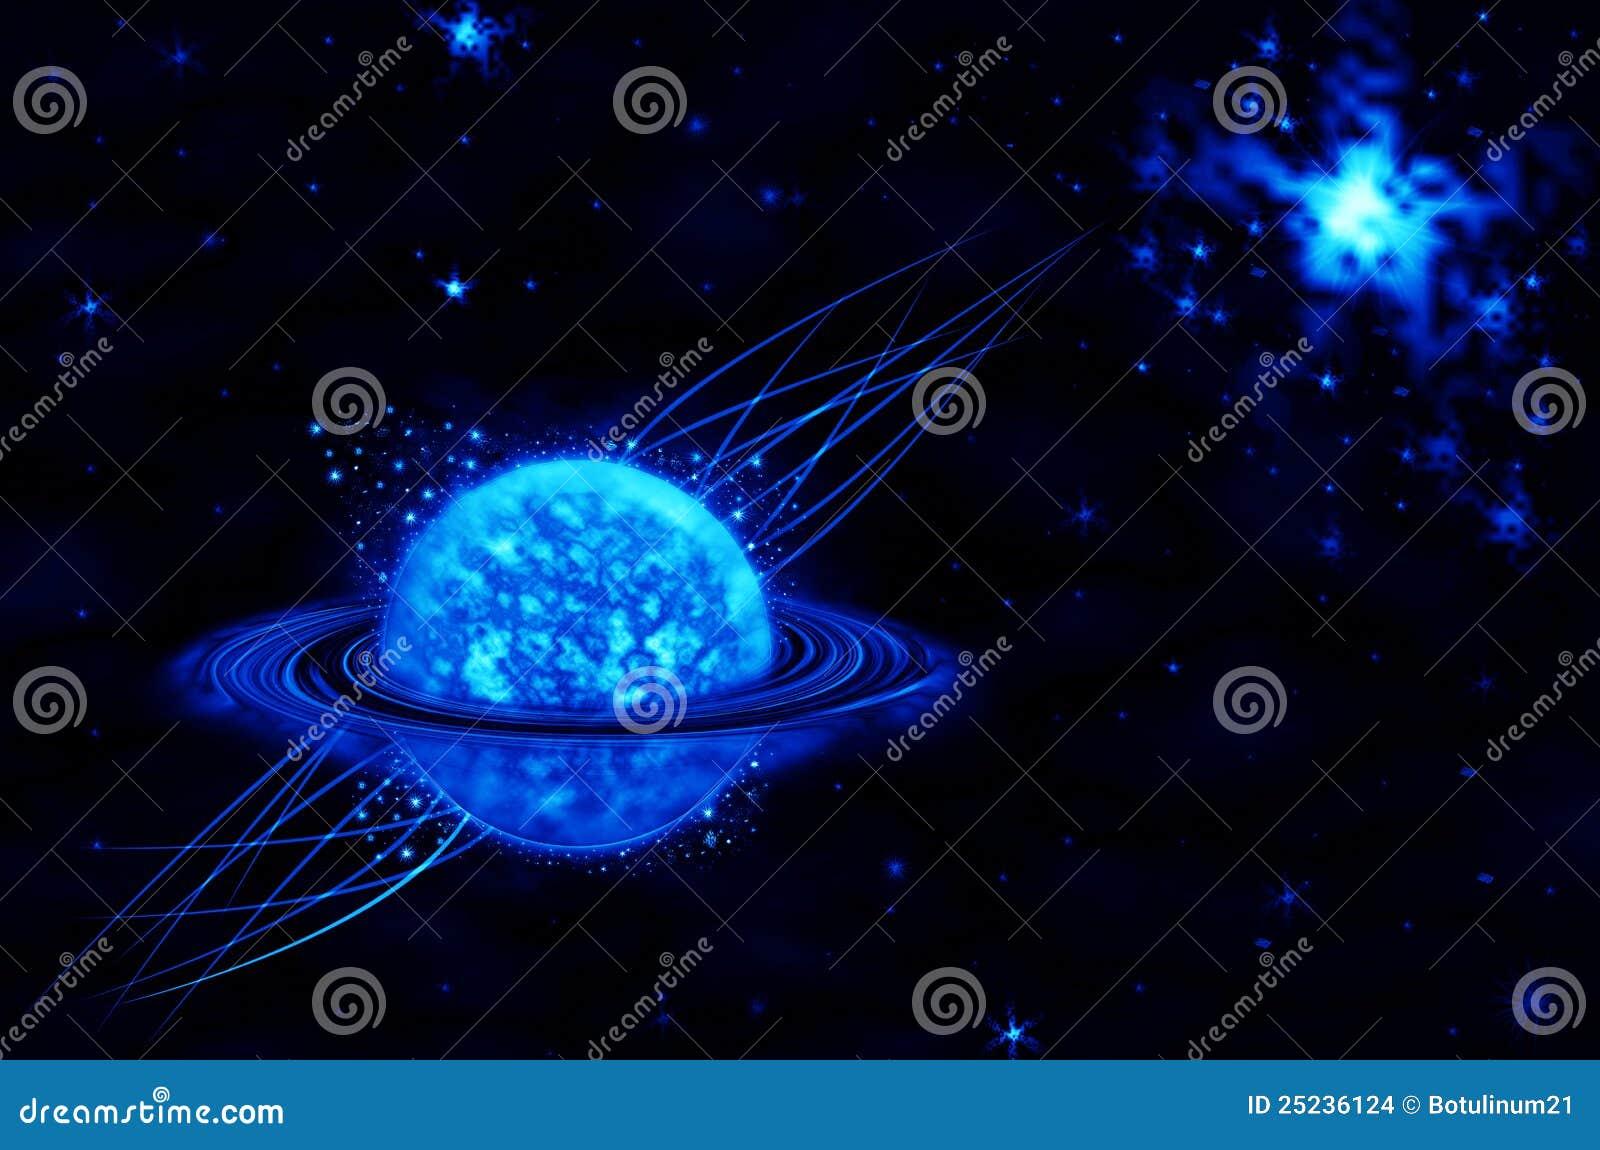 Blue Star On Black Background Stock Illustration - Image ...